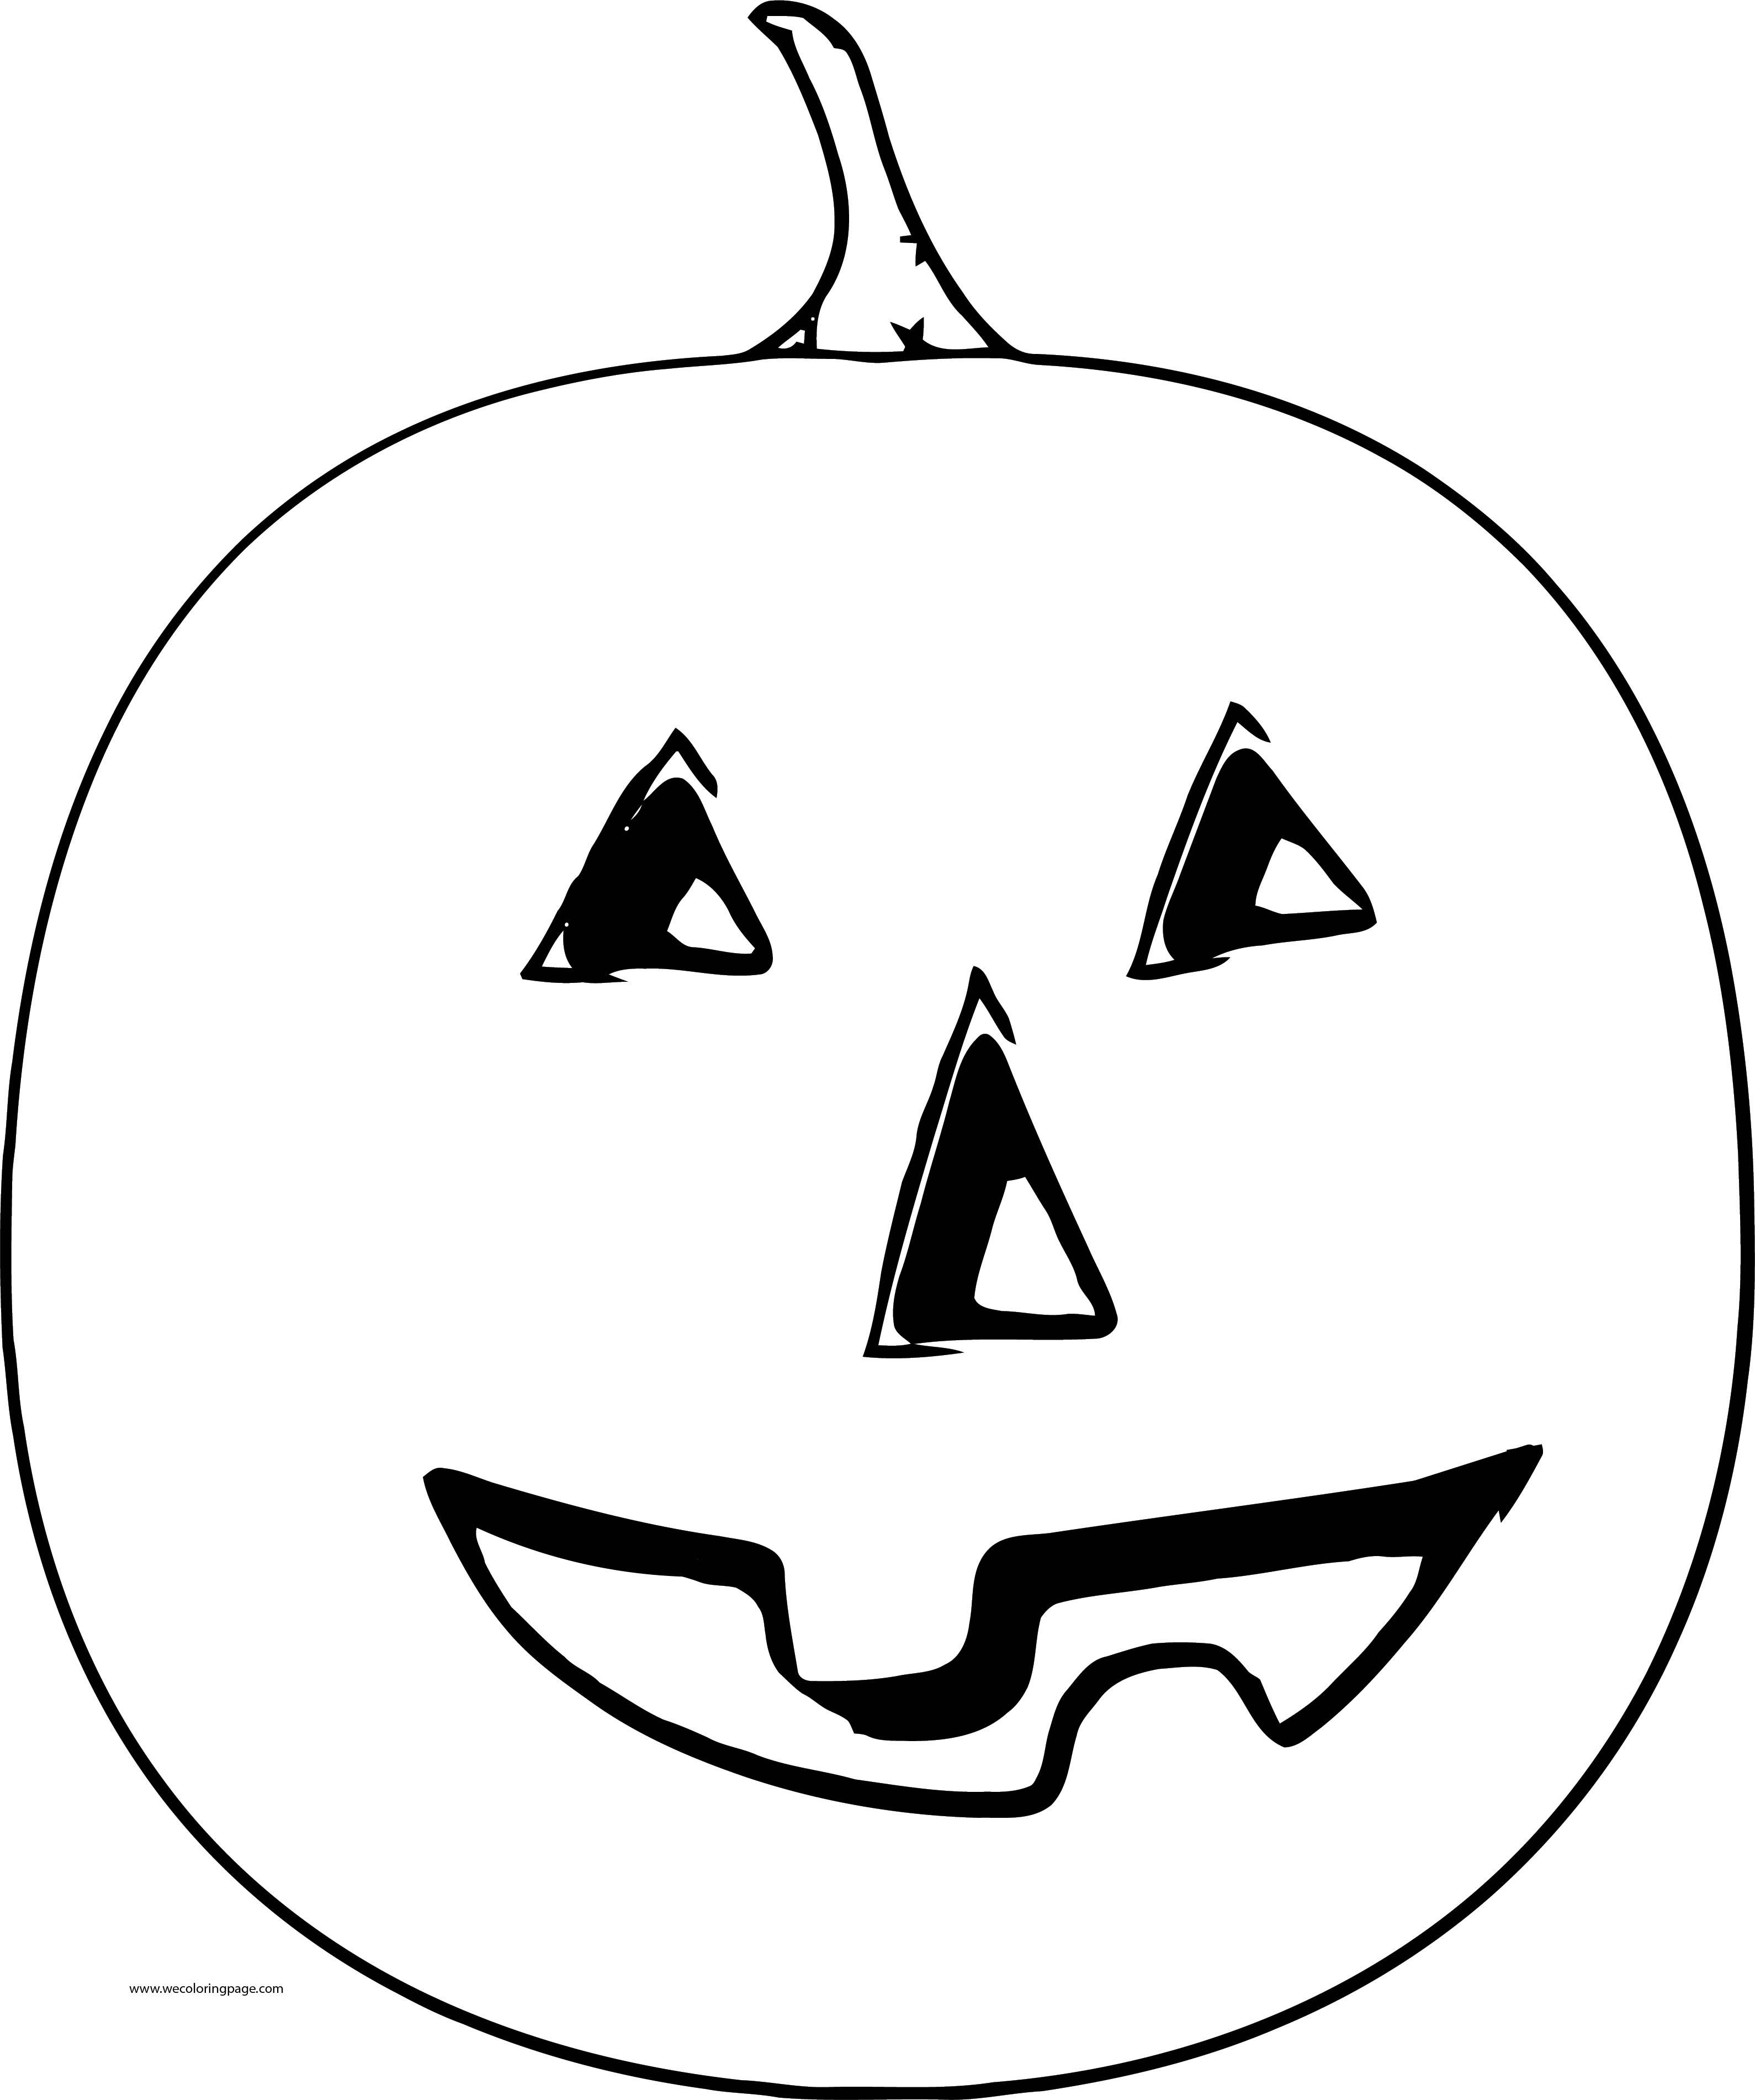 Fall Scream Pumpkin Coloring Page